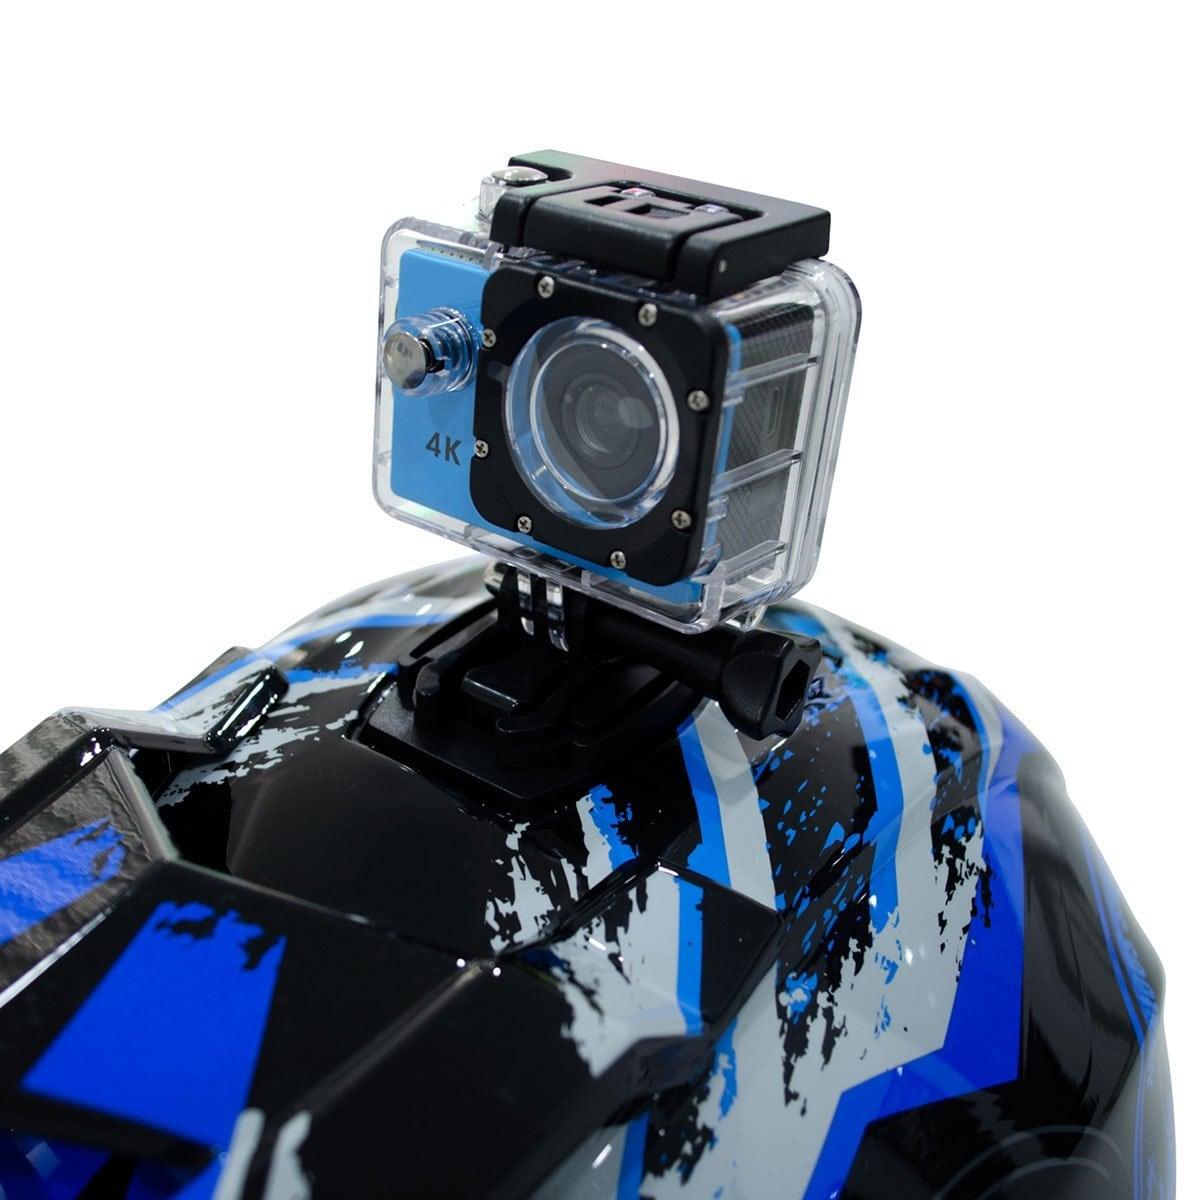 Casco Motocross Skull Azul Axus - Grande